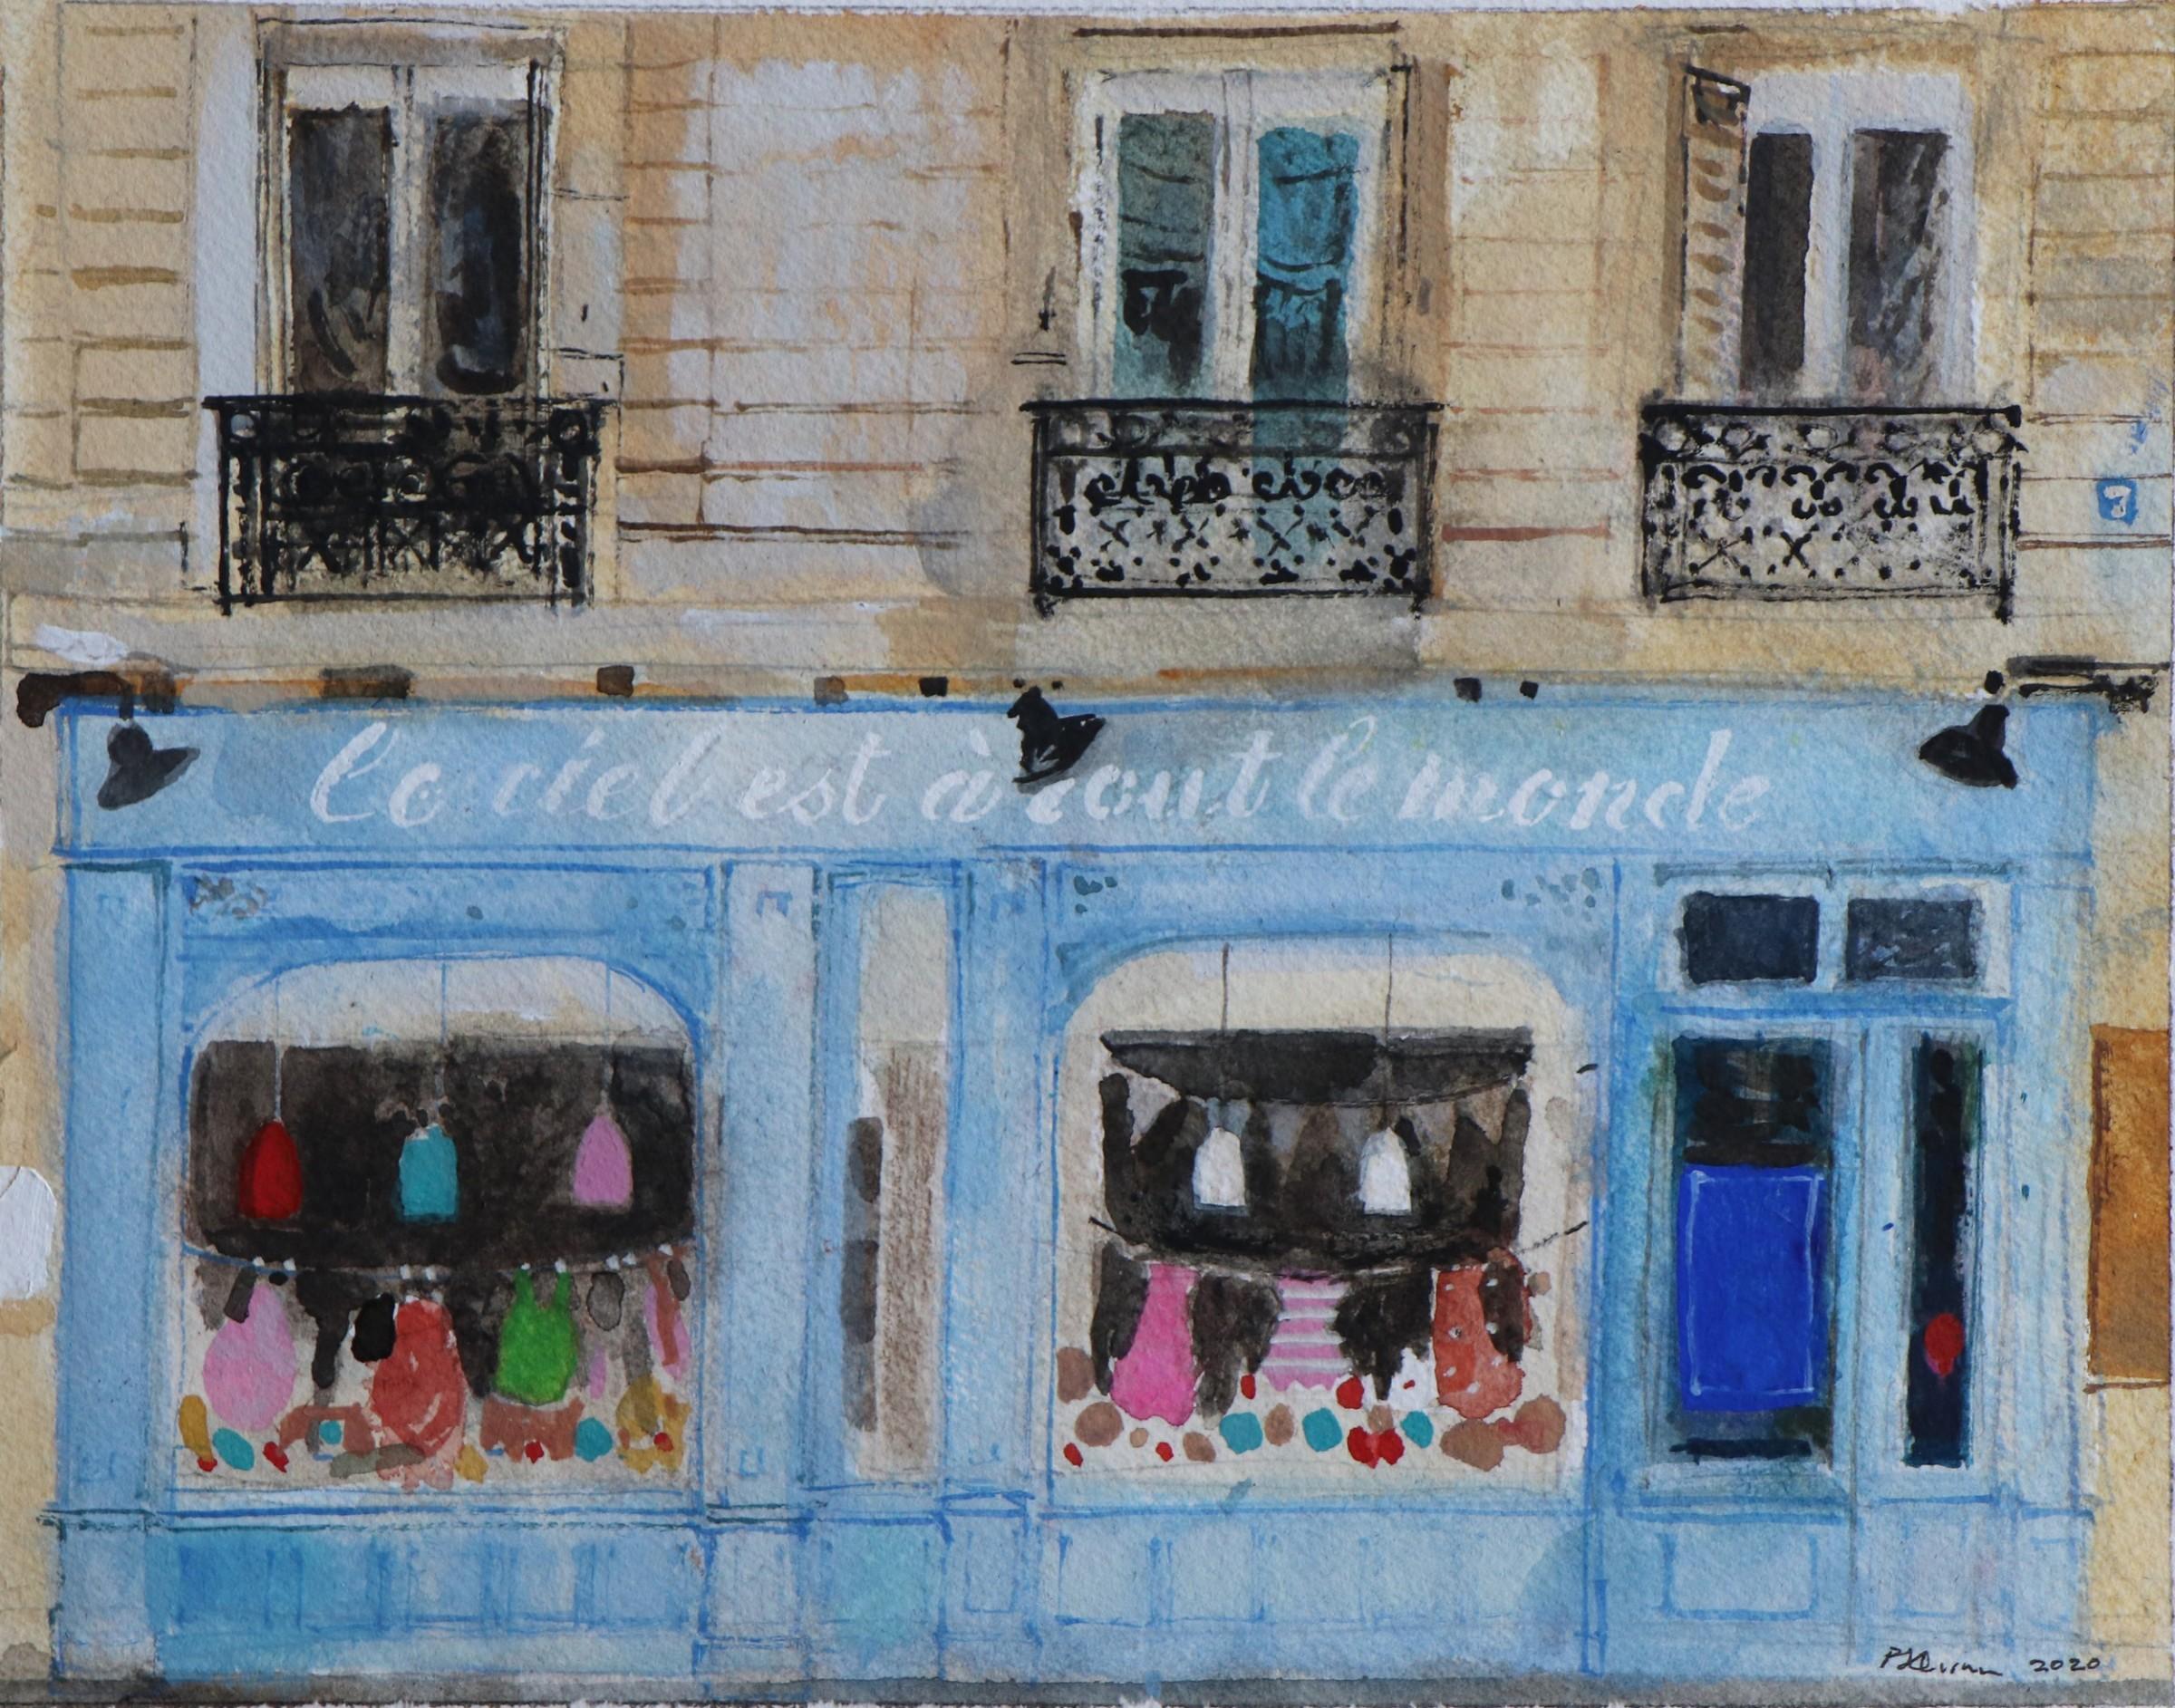 "<span class=""link fancybox-details-link""><a href=""/artists/96-peter-quinn/works/12296-peter-quinn-paris-shop/"">View Detail Page</a></span><div class=""artist""><span class=""artist""><strong>Peter Quinn</strong></span></div><div class=""title""><em>Paris, Shop</em></div><div class=""medium"">watercolour on paper</div><div class=""dimensions"">Frame: 40 x 46 cm<br /> </div><div class=""price"">£450.00</div>"